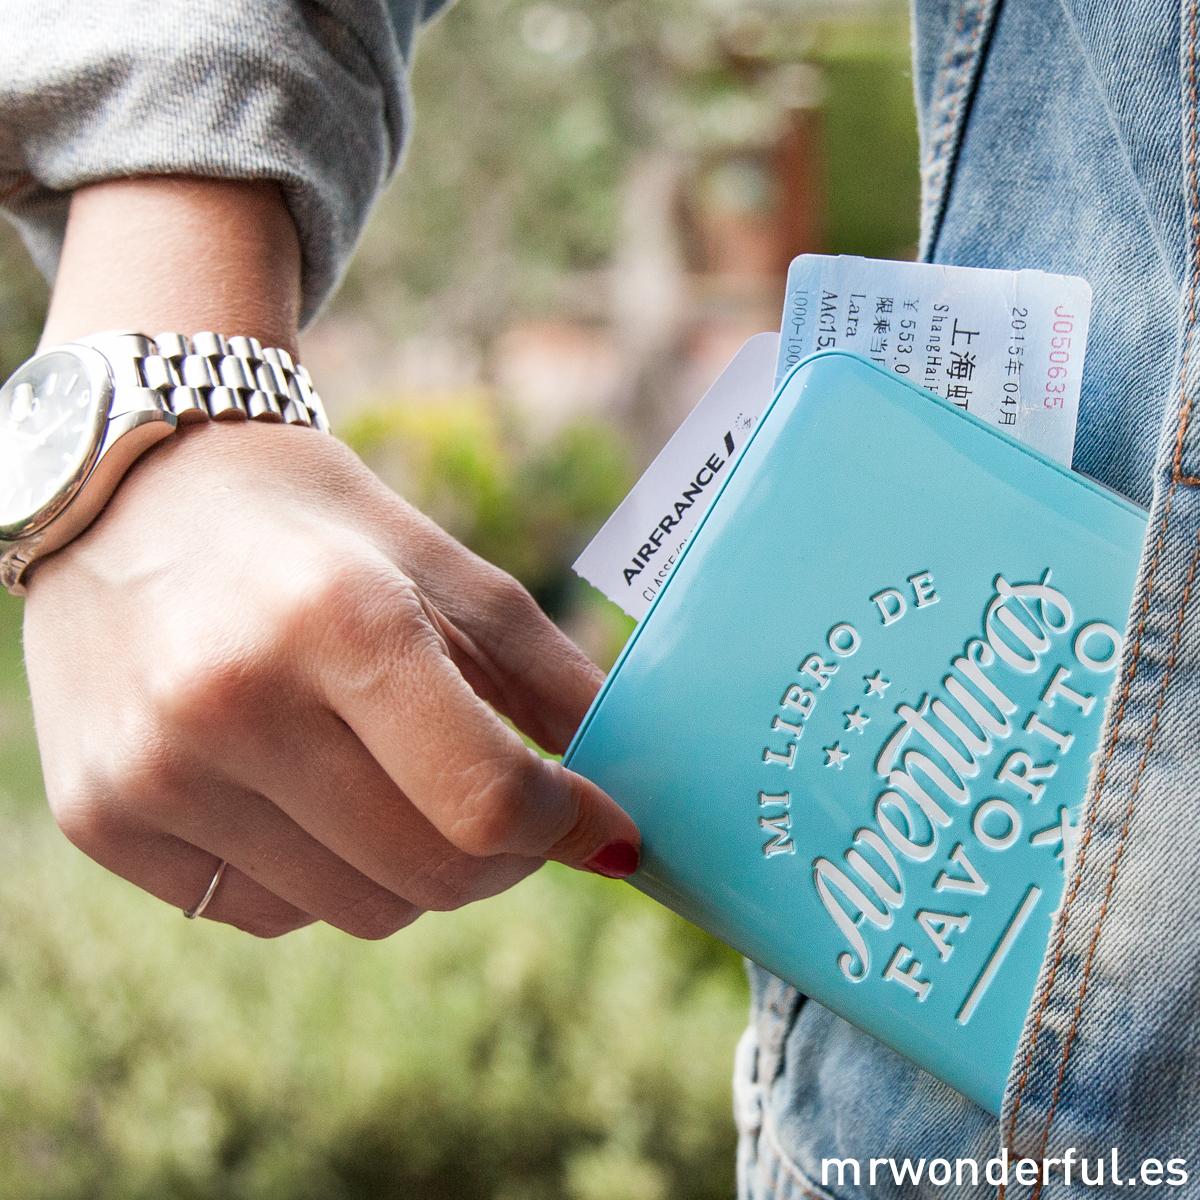 mrwonderful_funda-pasaporte-mi-libro-de-aventuras-1